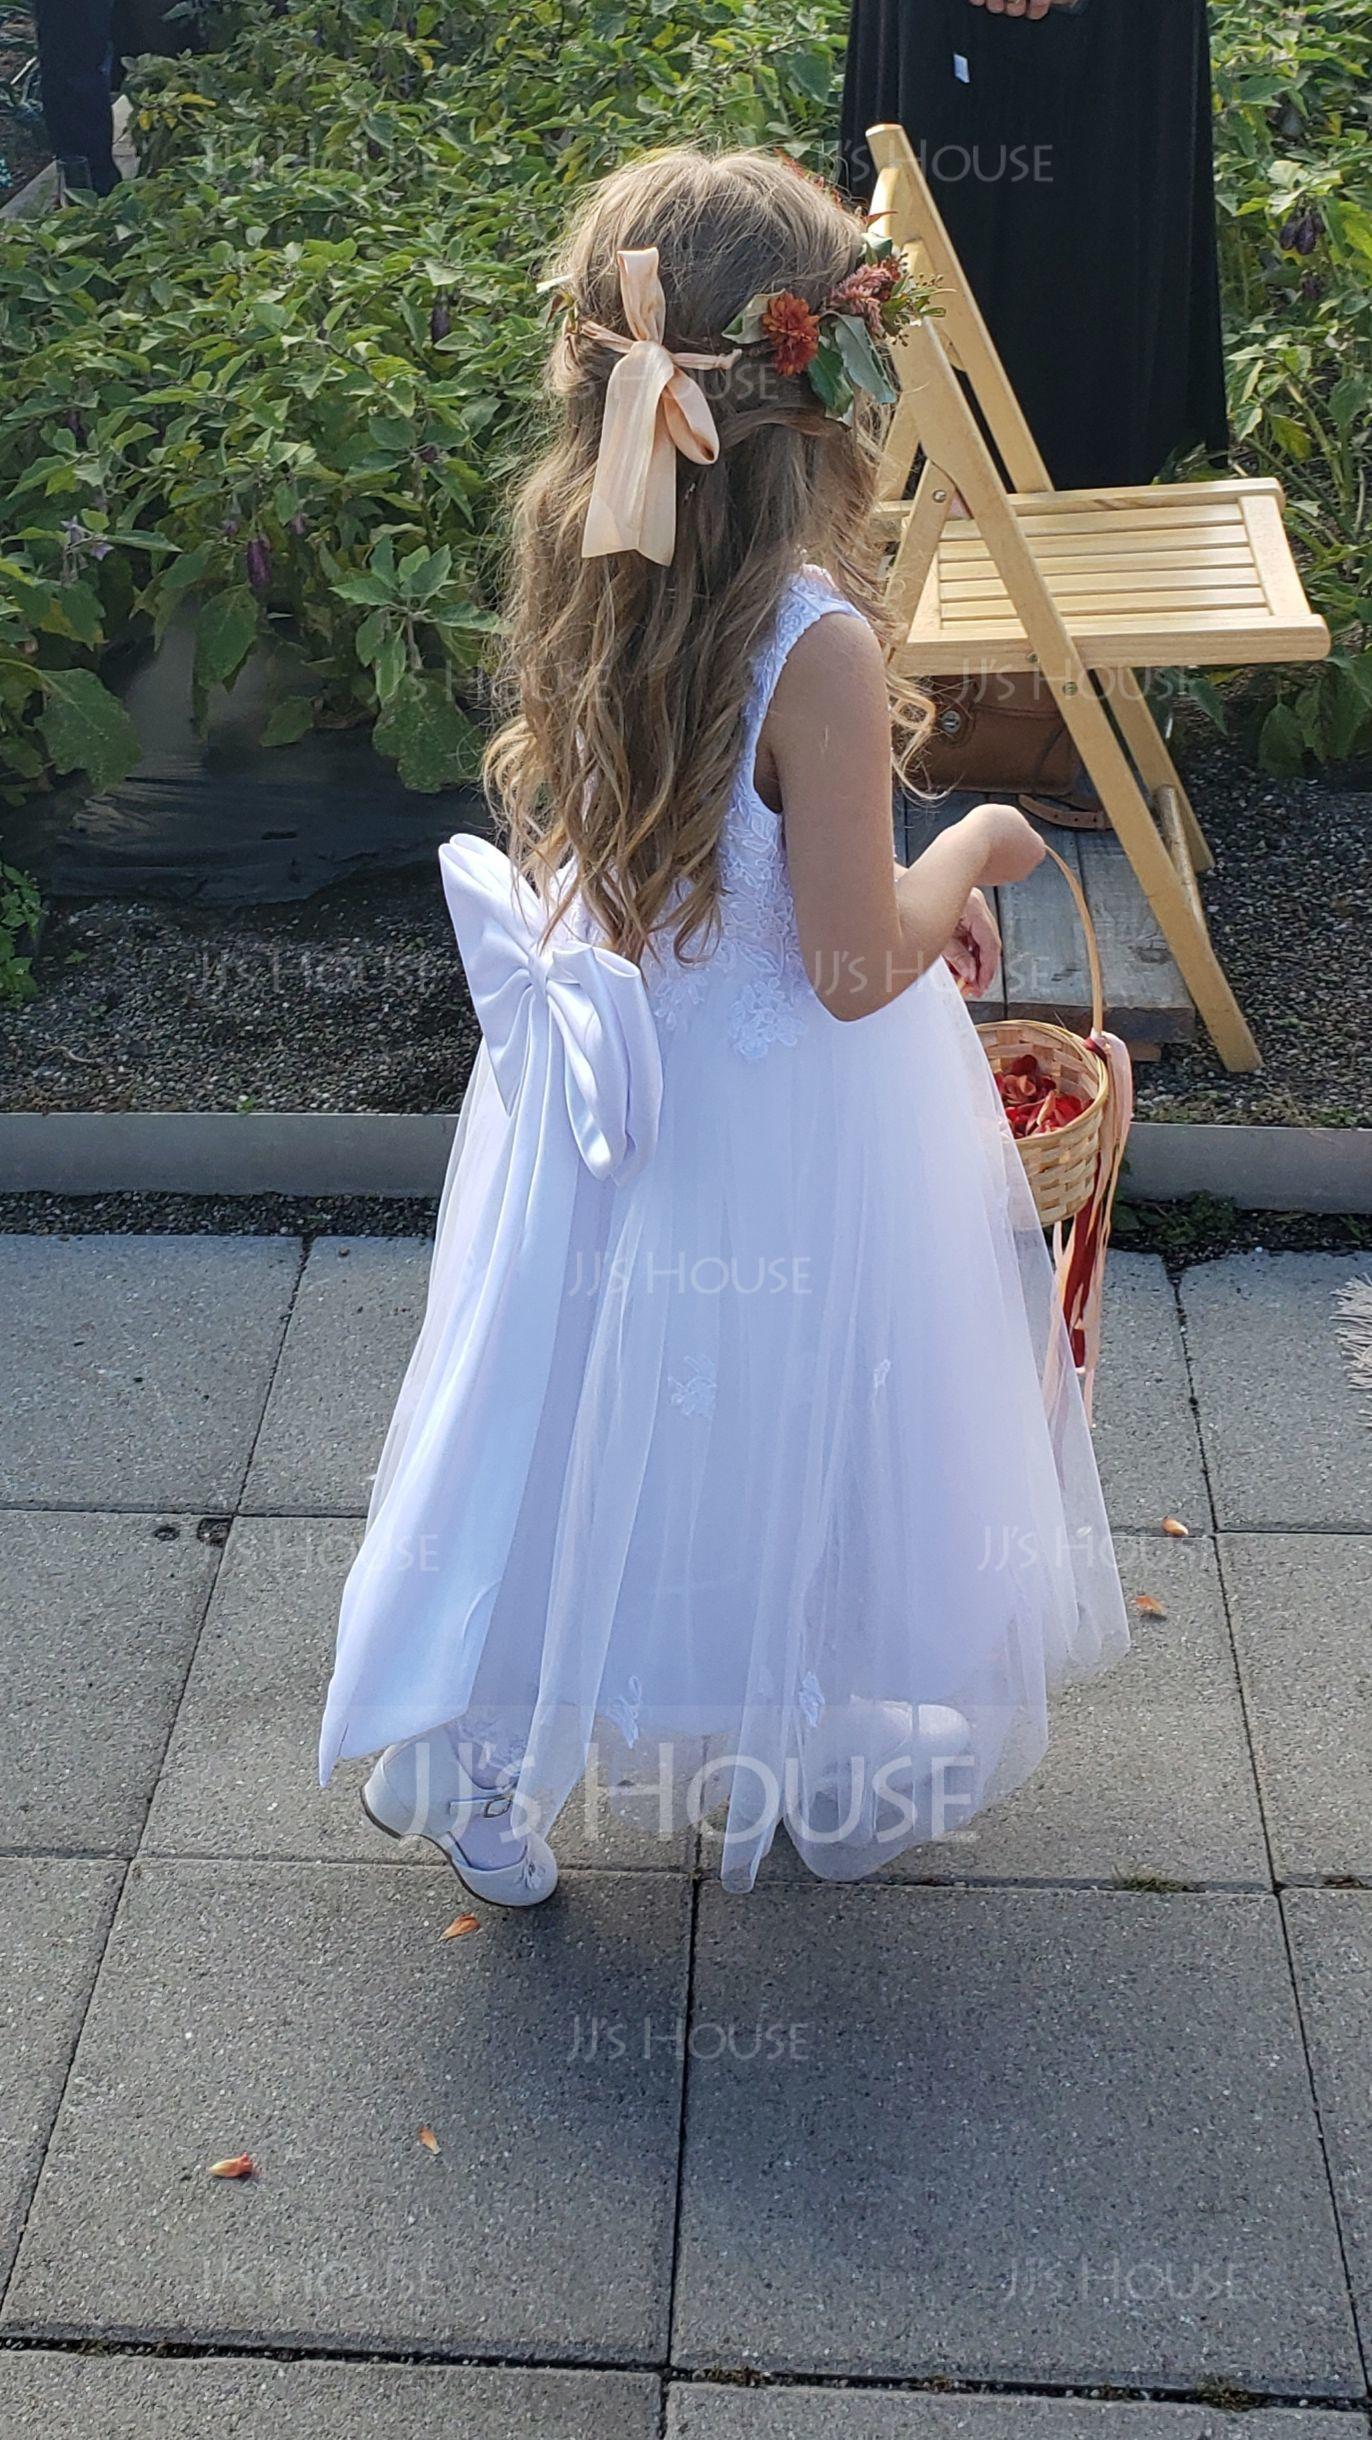 A-Line/Princess Tea-length Flower Girl Dress - Satin/Tulle Sleeveless Scoop Neck With Bow(s) (010094047)